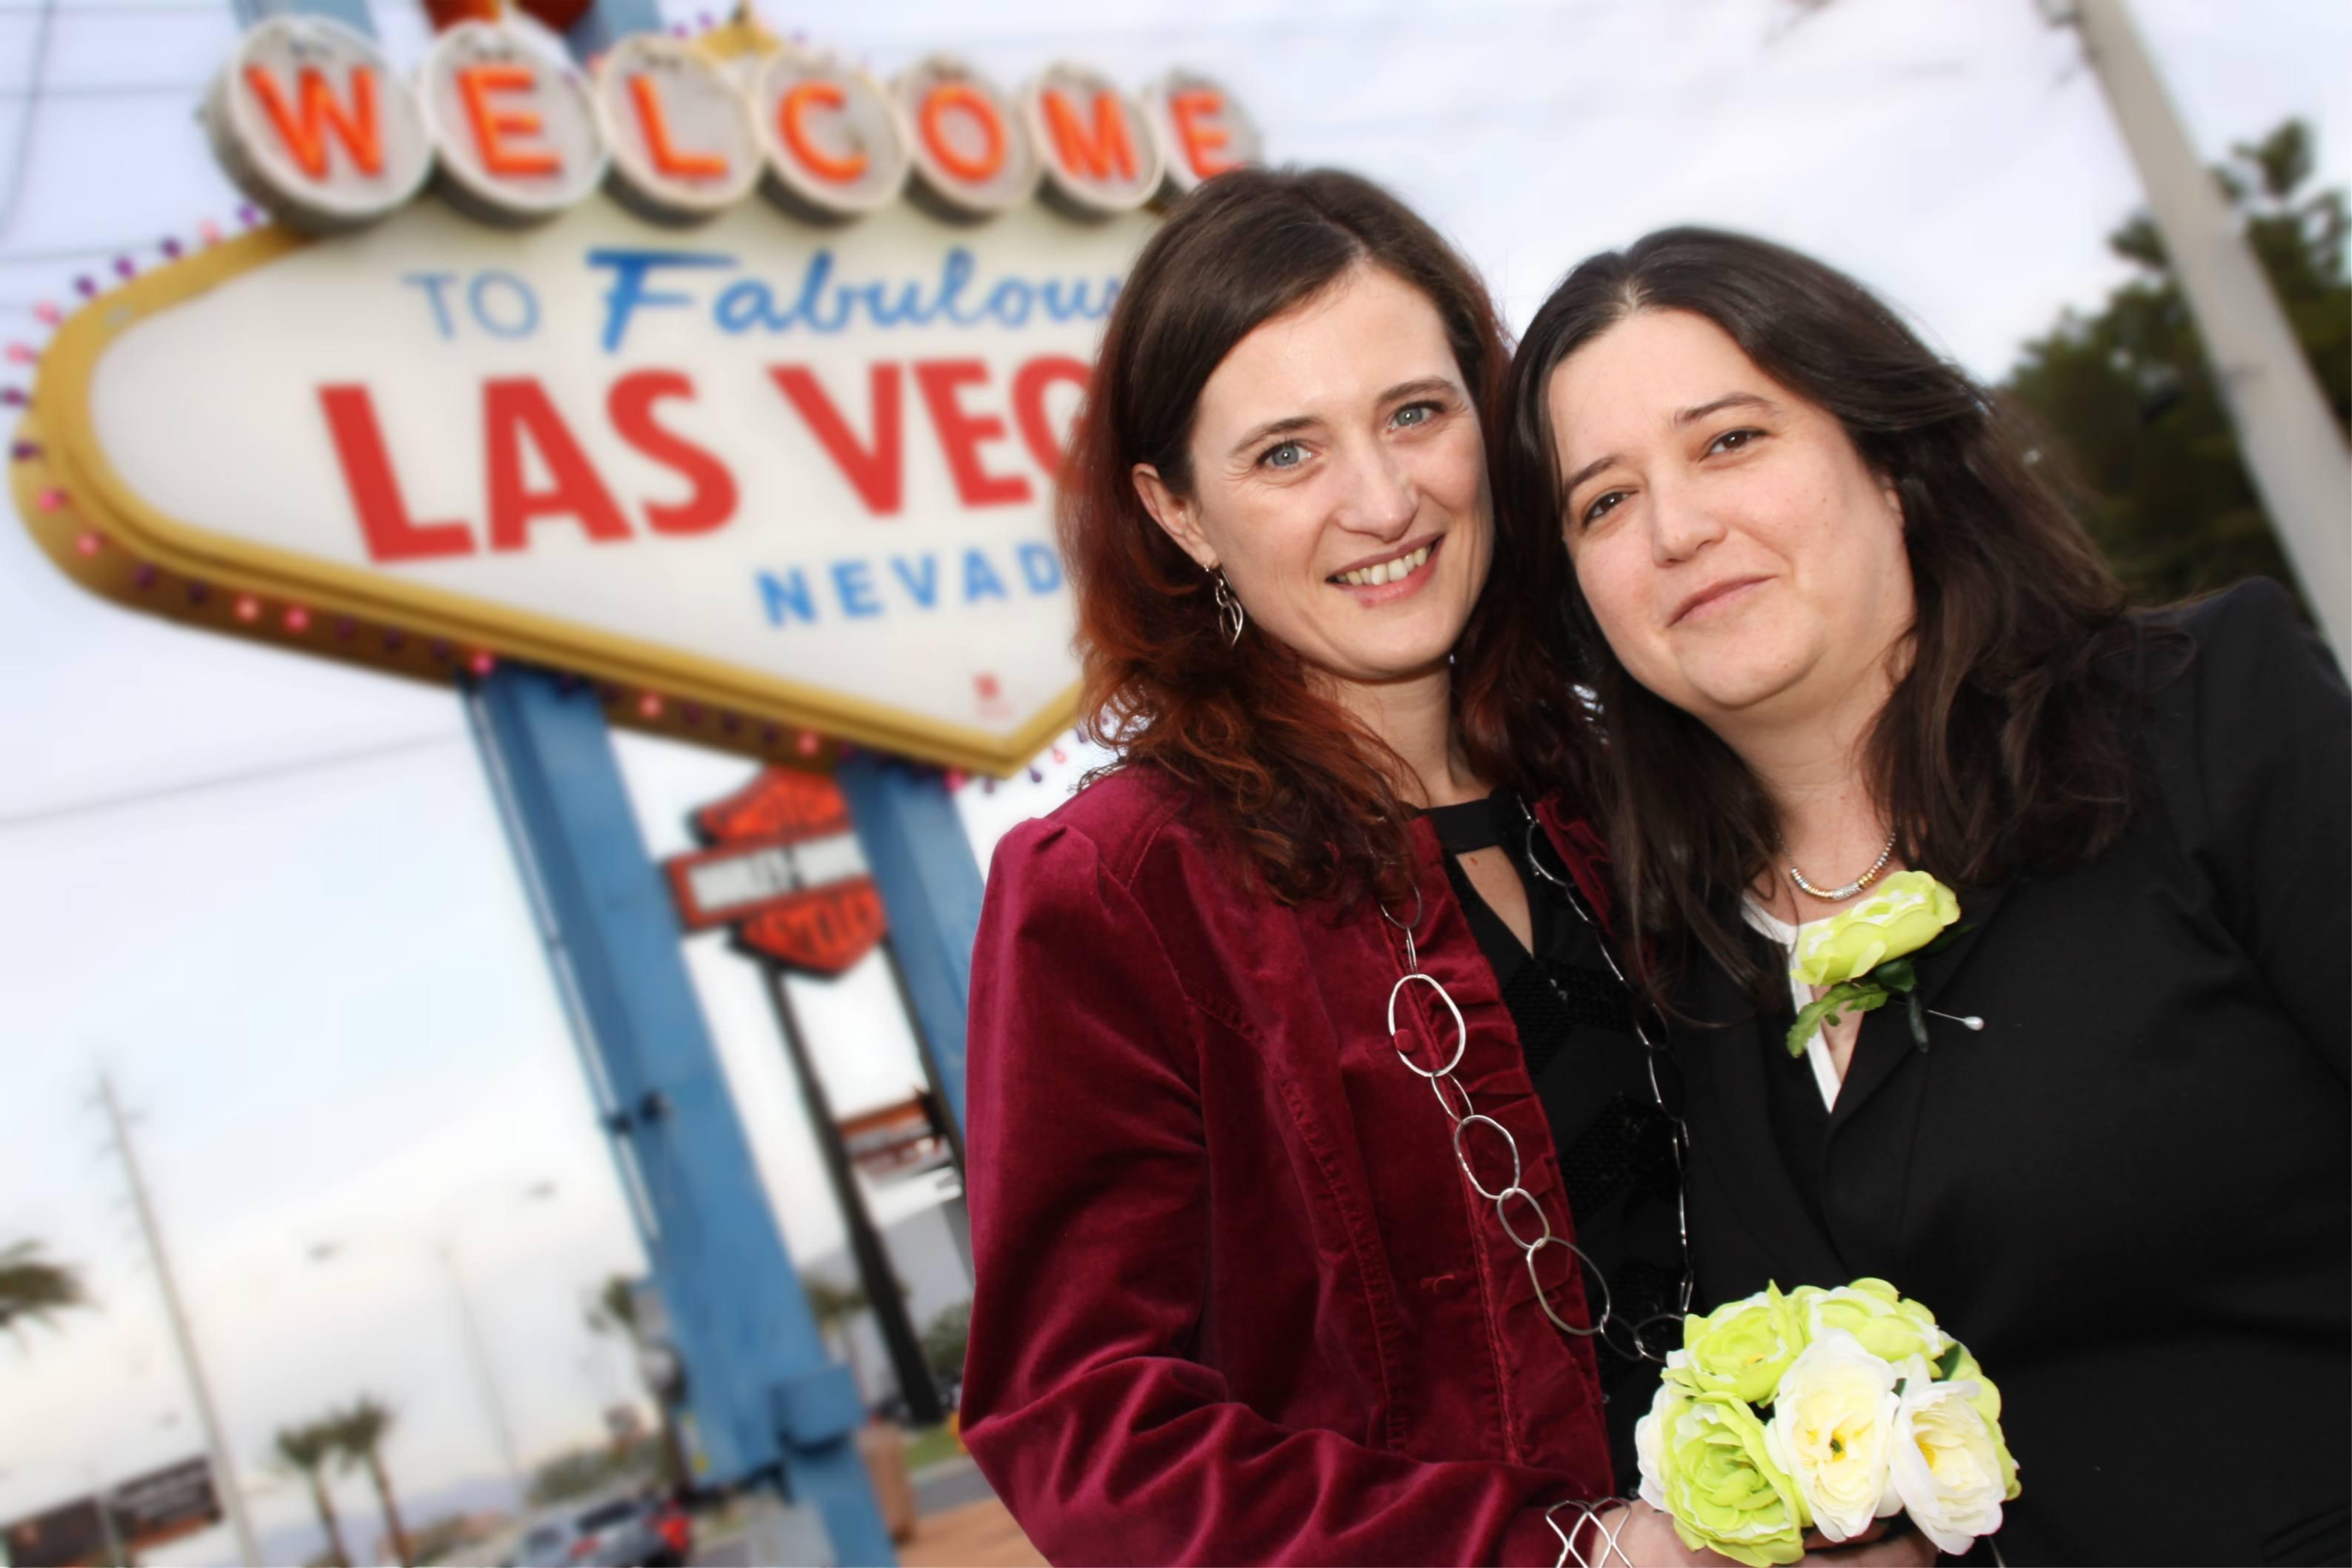 Las Vegas sign weddings are always fun